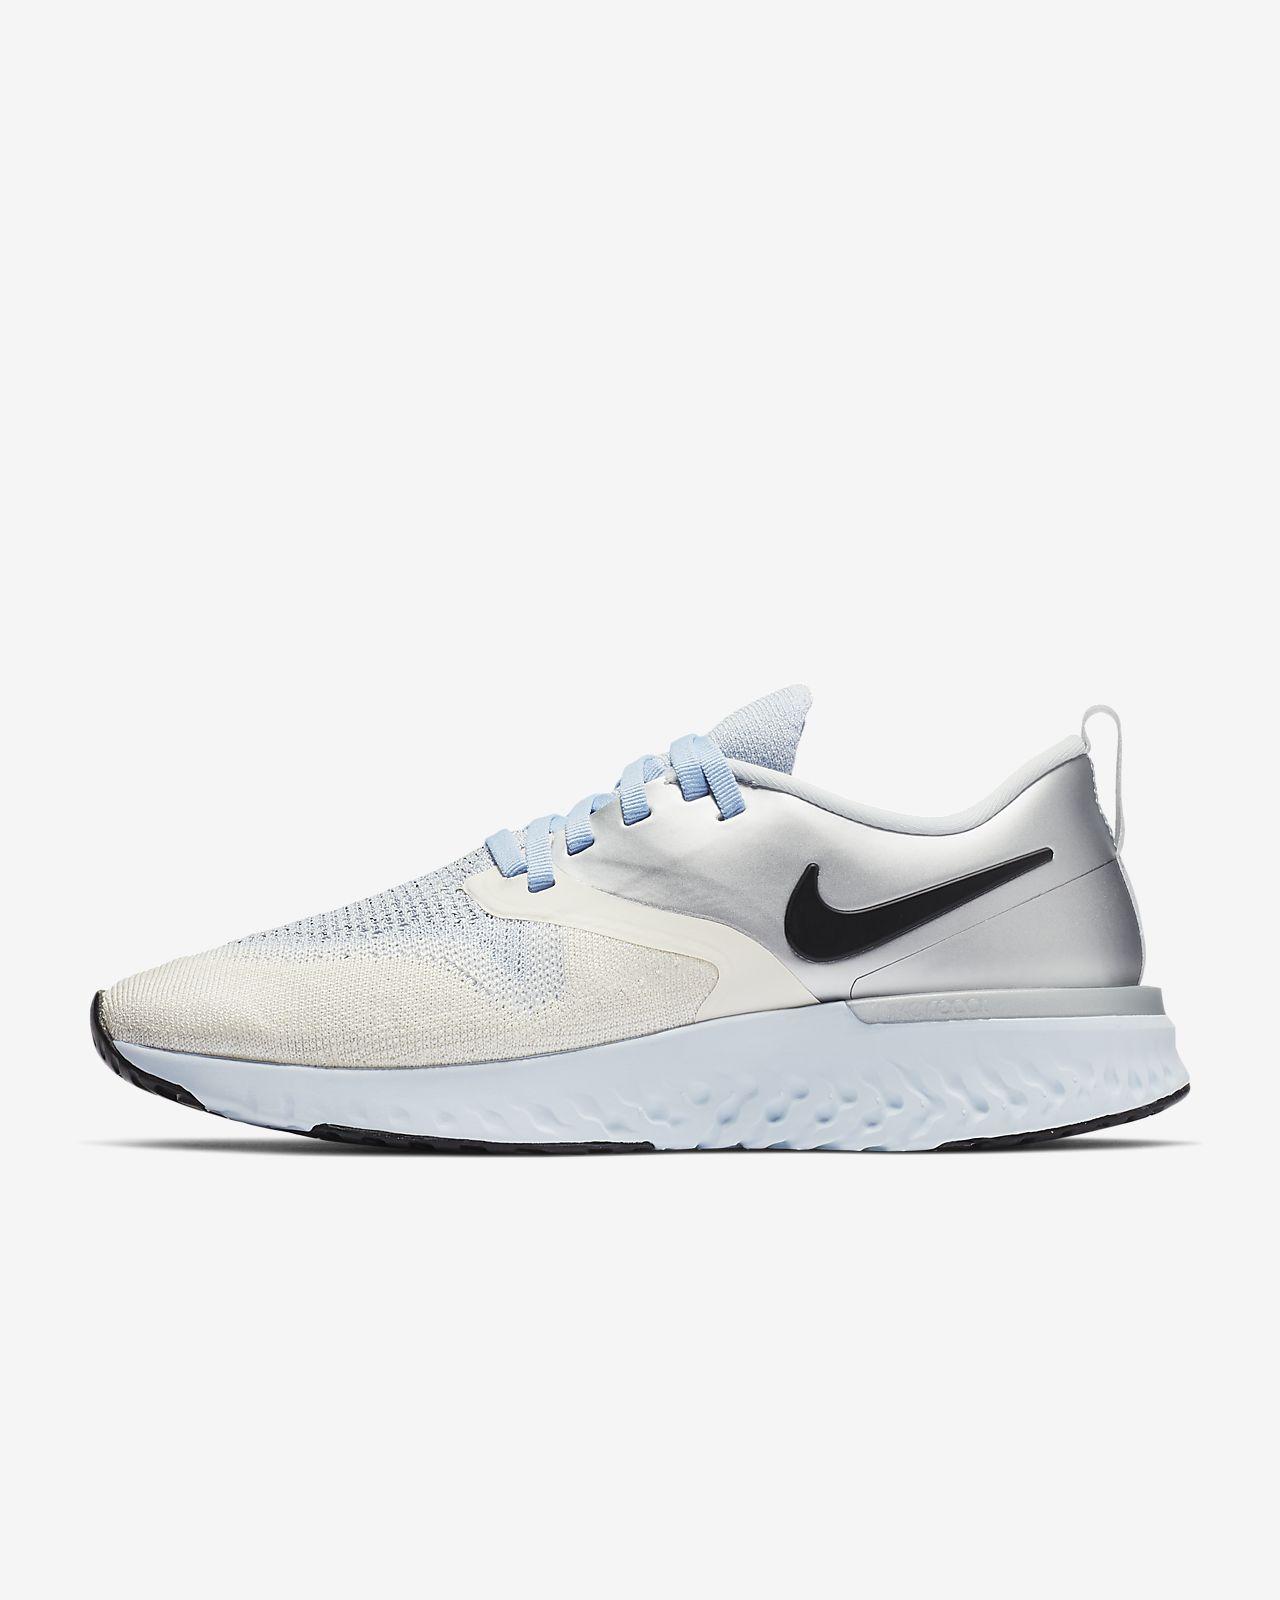 Sapatilhas de running Nike Odyssey React Flyknit 2 Premium para mulher